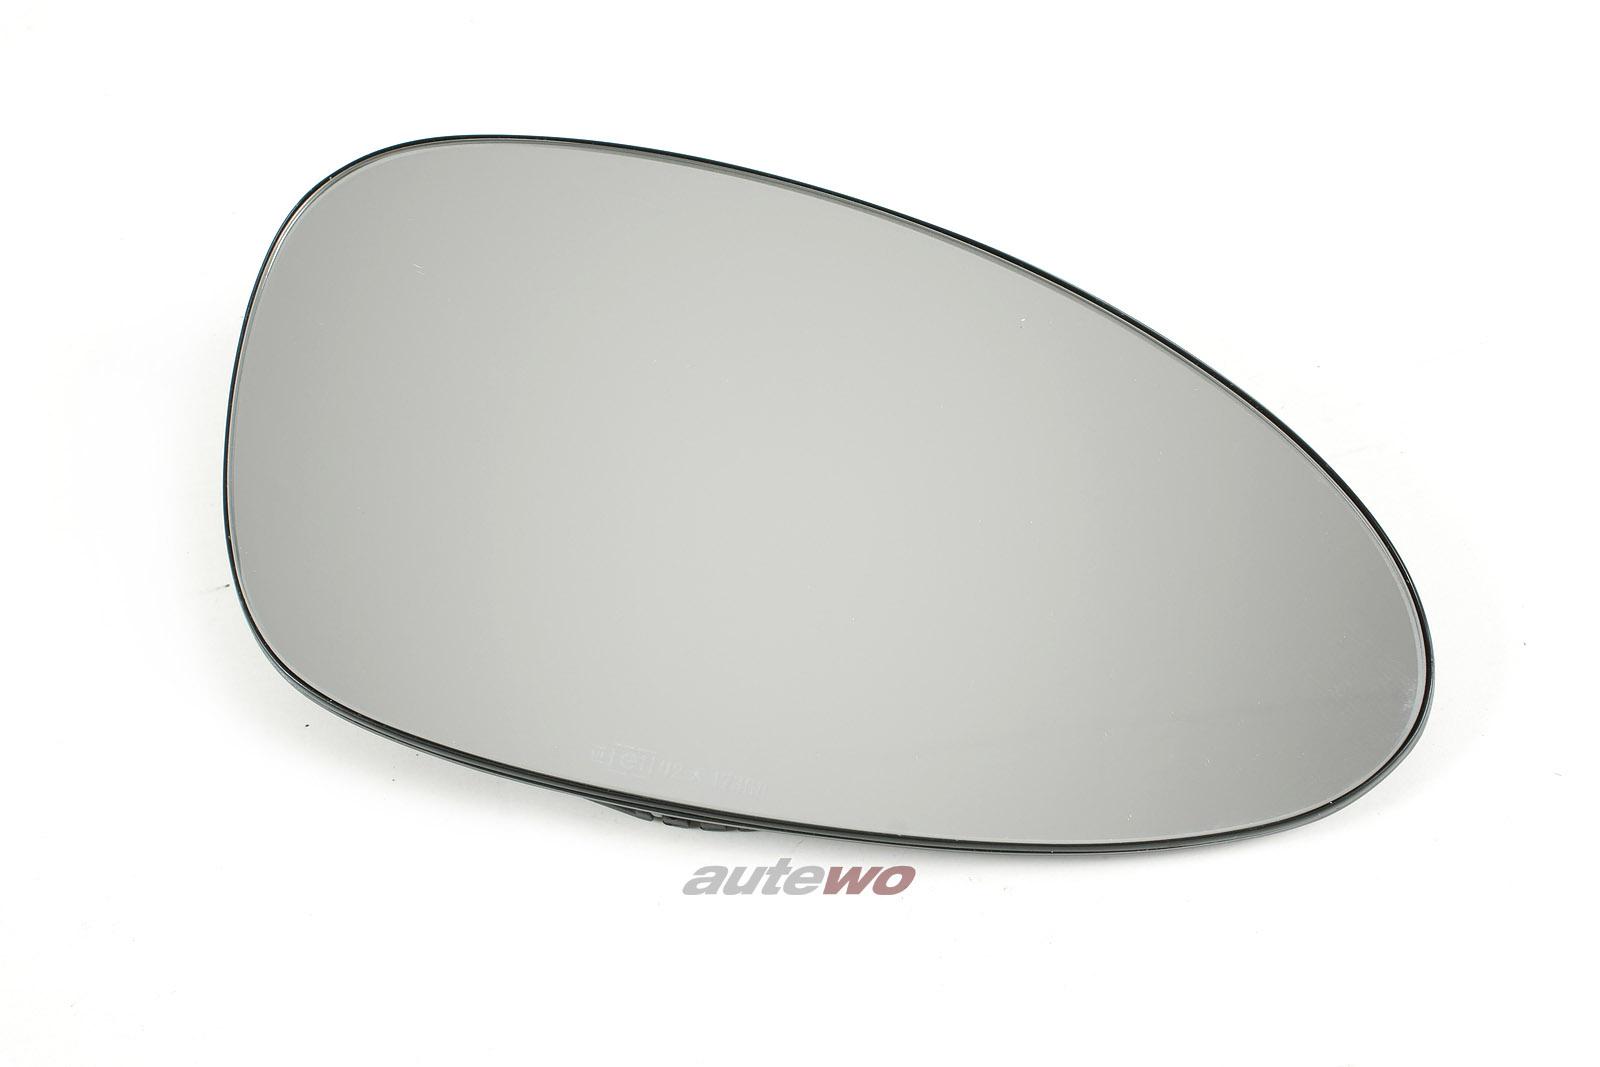 8A0857536 NEU Audi RS2 Außenspiegelglas beheizbar Rechts